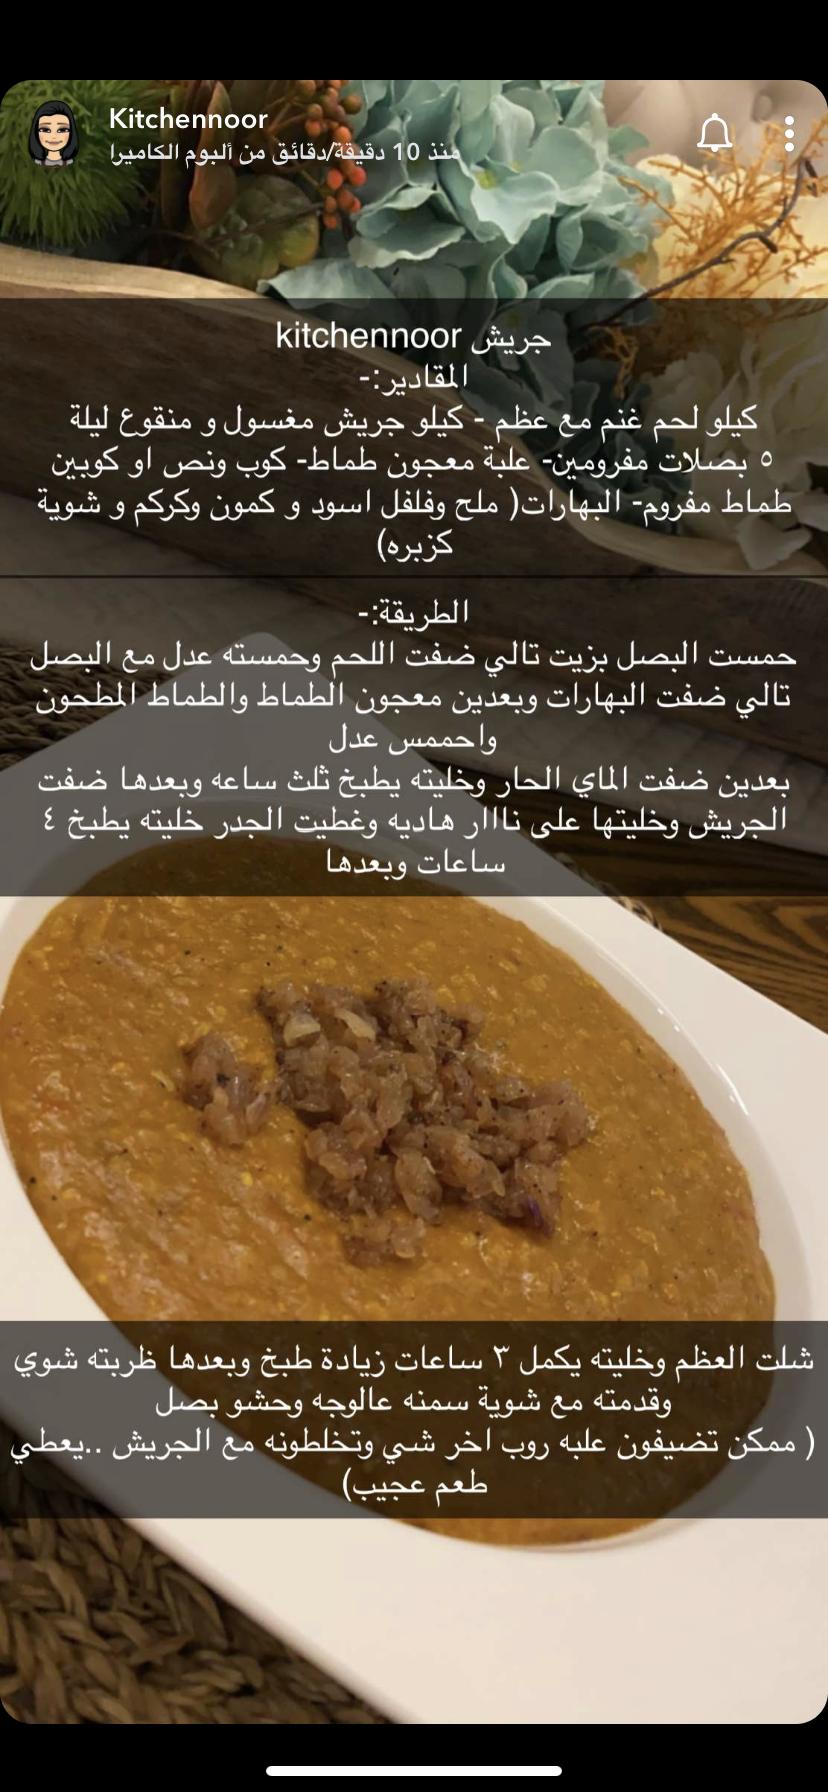 جريش احمر Cooking Recipes Food Recipies Cooking